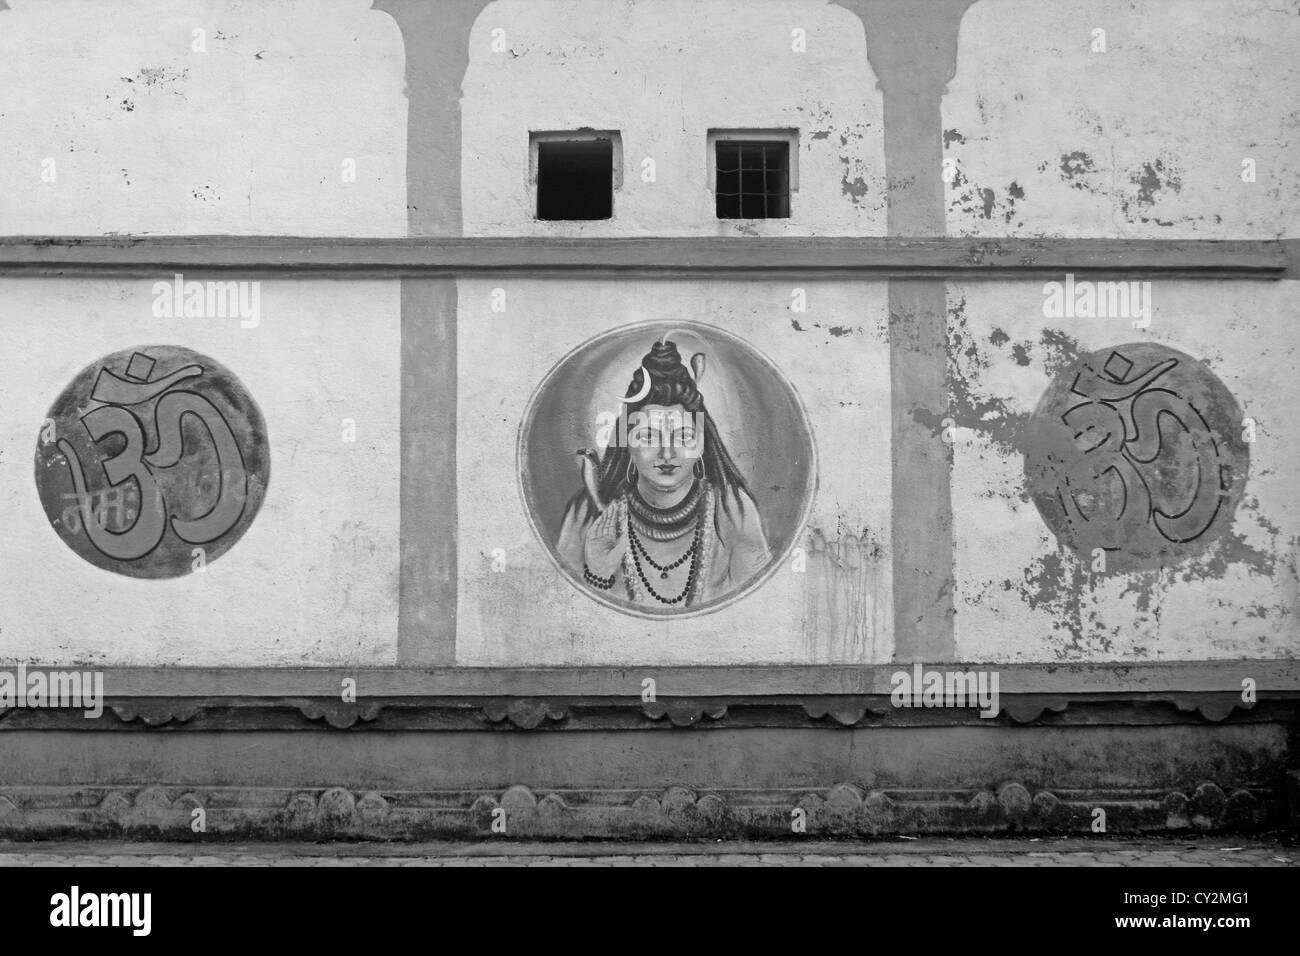 Lord Shiva Painting, India - Stock Image